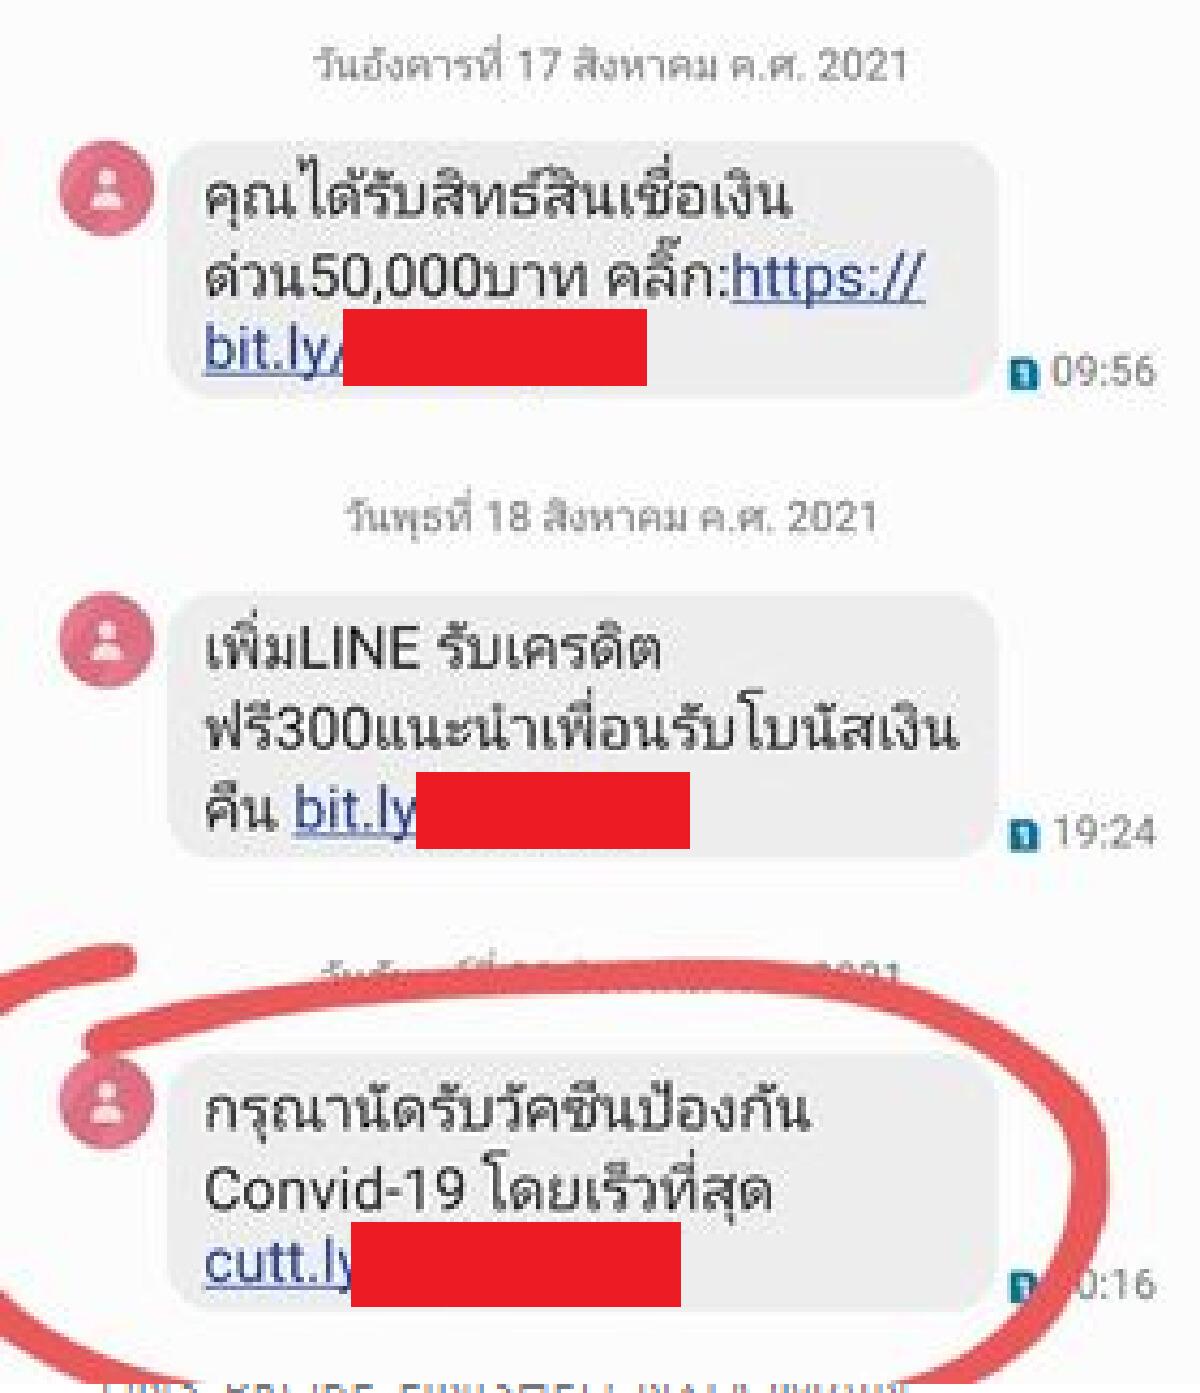 SMS หลอกลวงรูปแบบใหม่